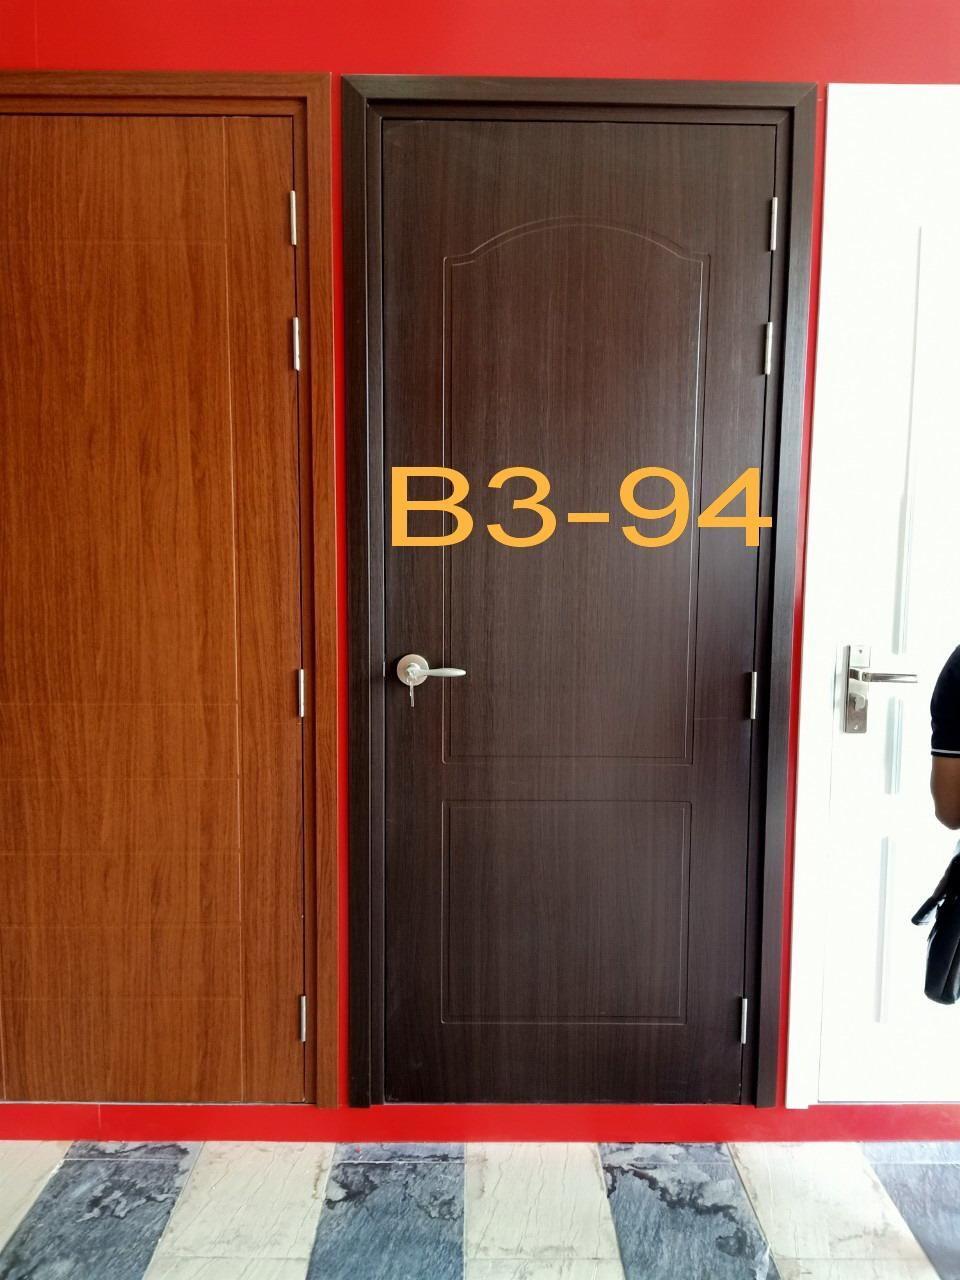 Chọn cửa phòng ngủ: nhựa composite hay cửa gỗ MDF Melamine